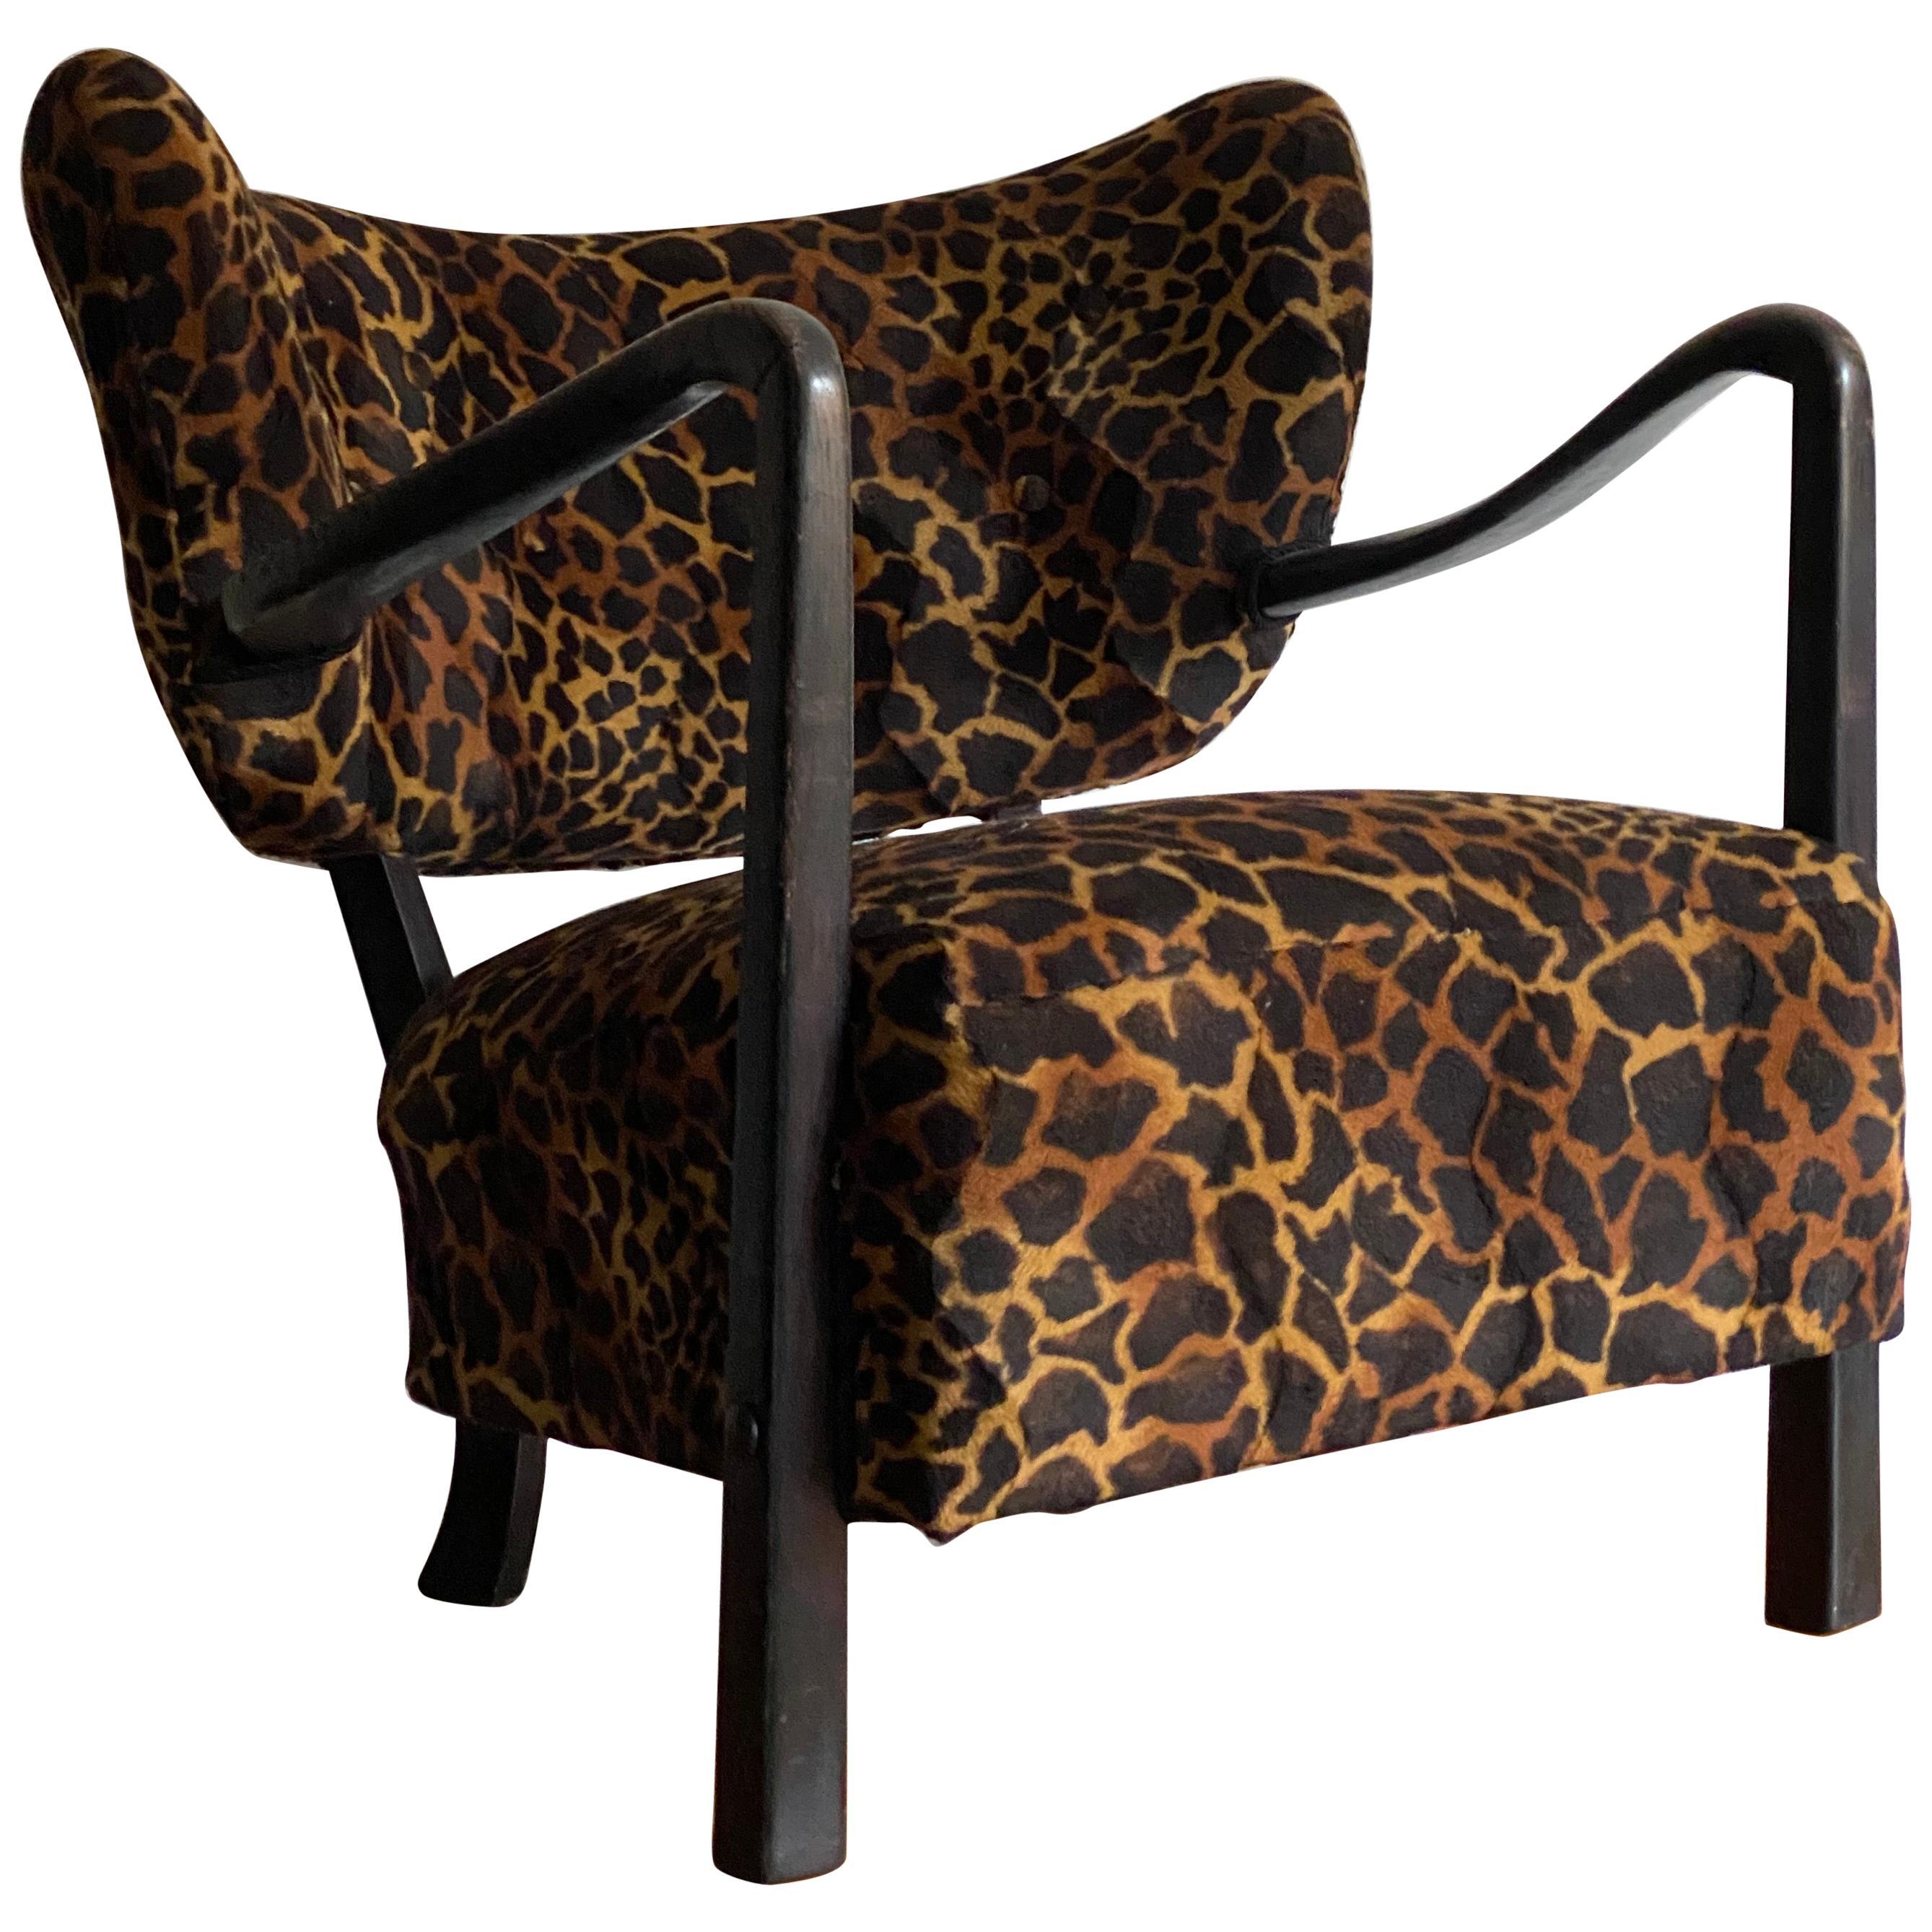 Viggo Boesen 'Attributed' Lounge Chair, Dark Stained Beech, Fabric, 1940s